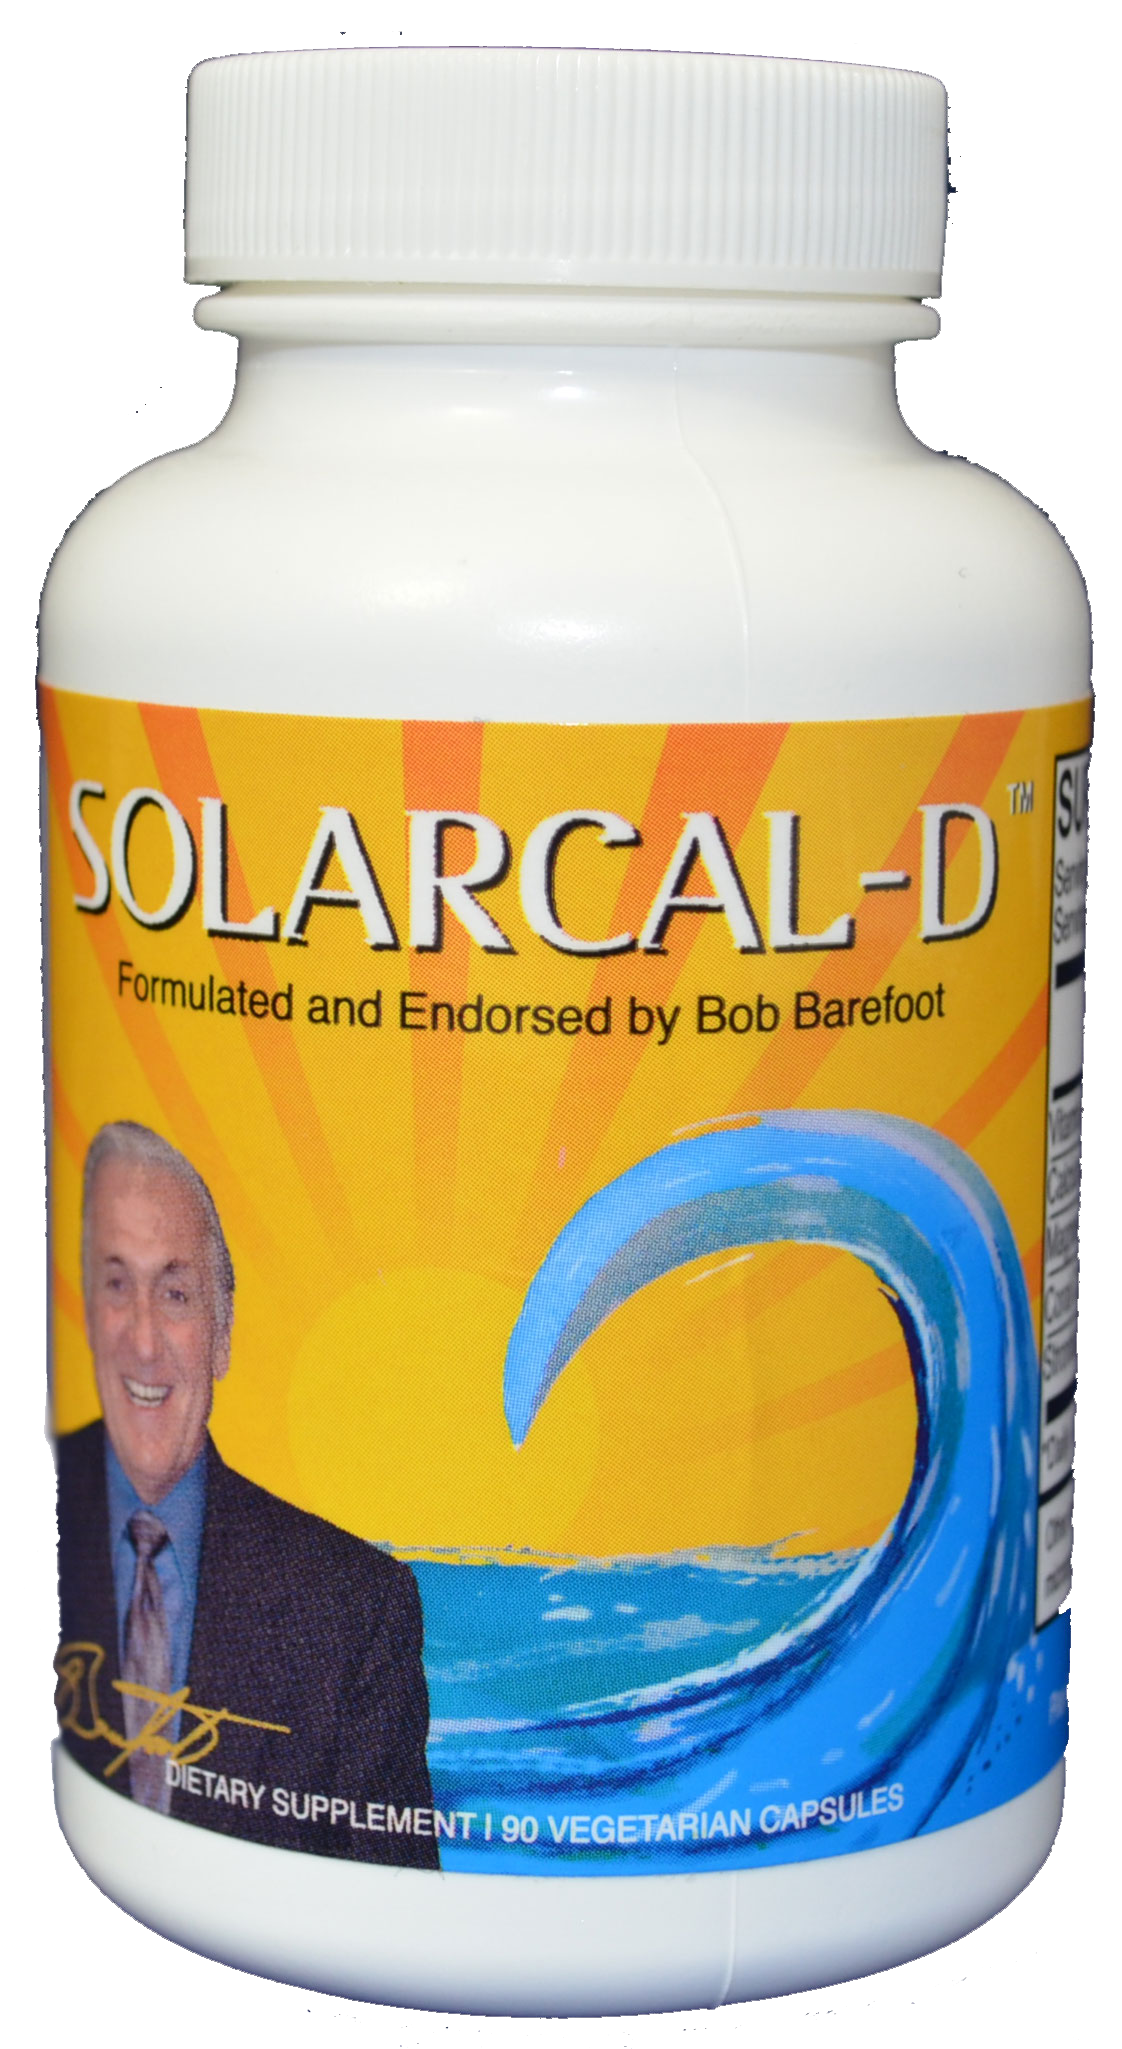 solarcal d